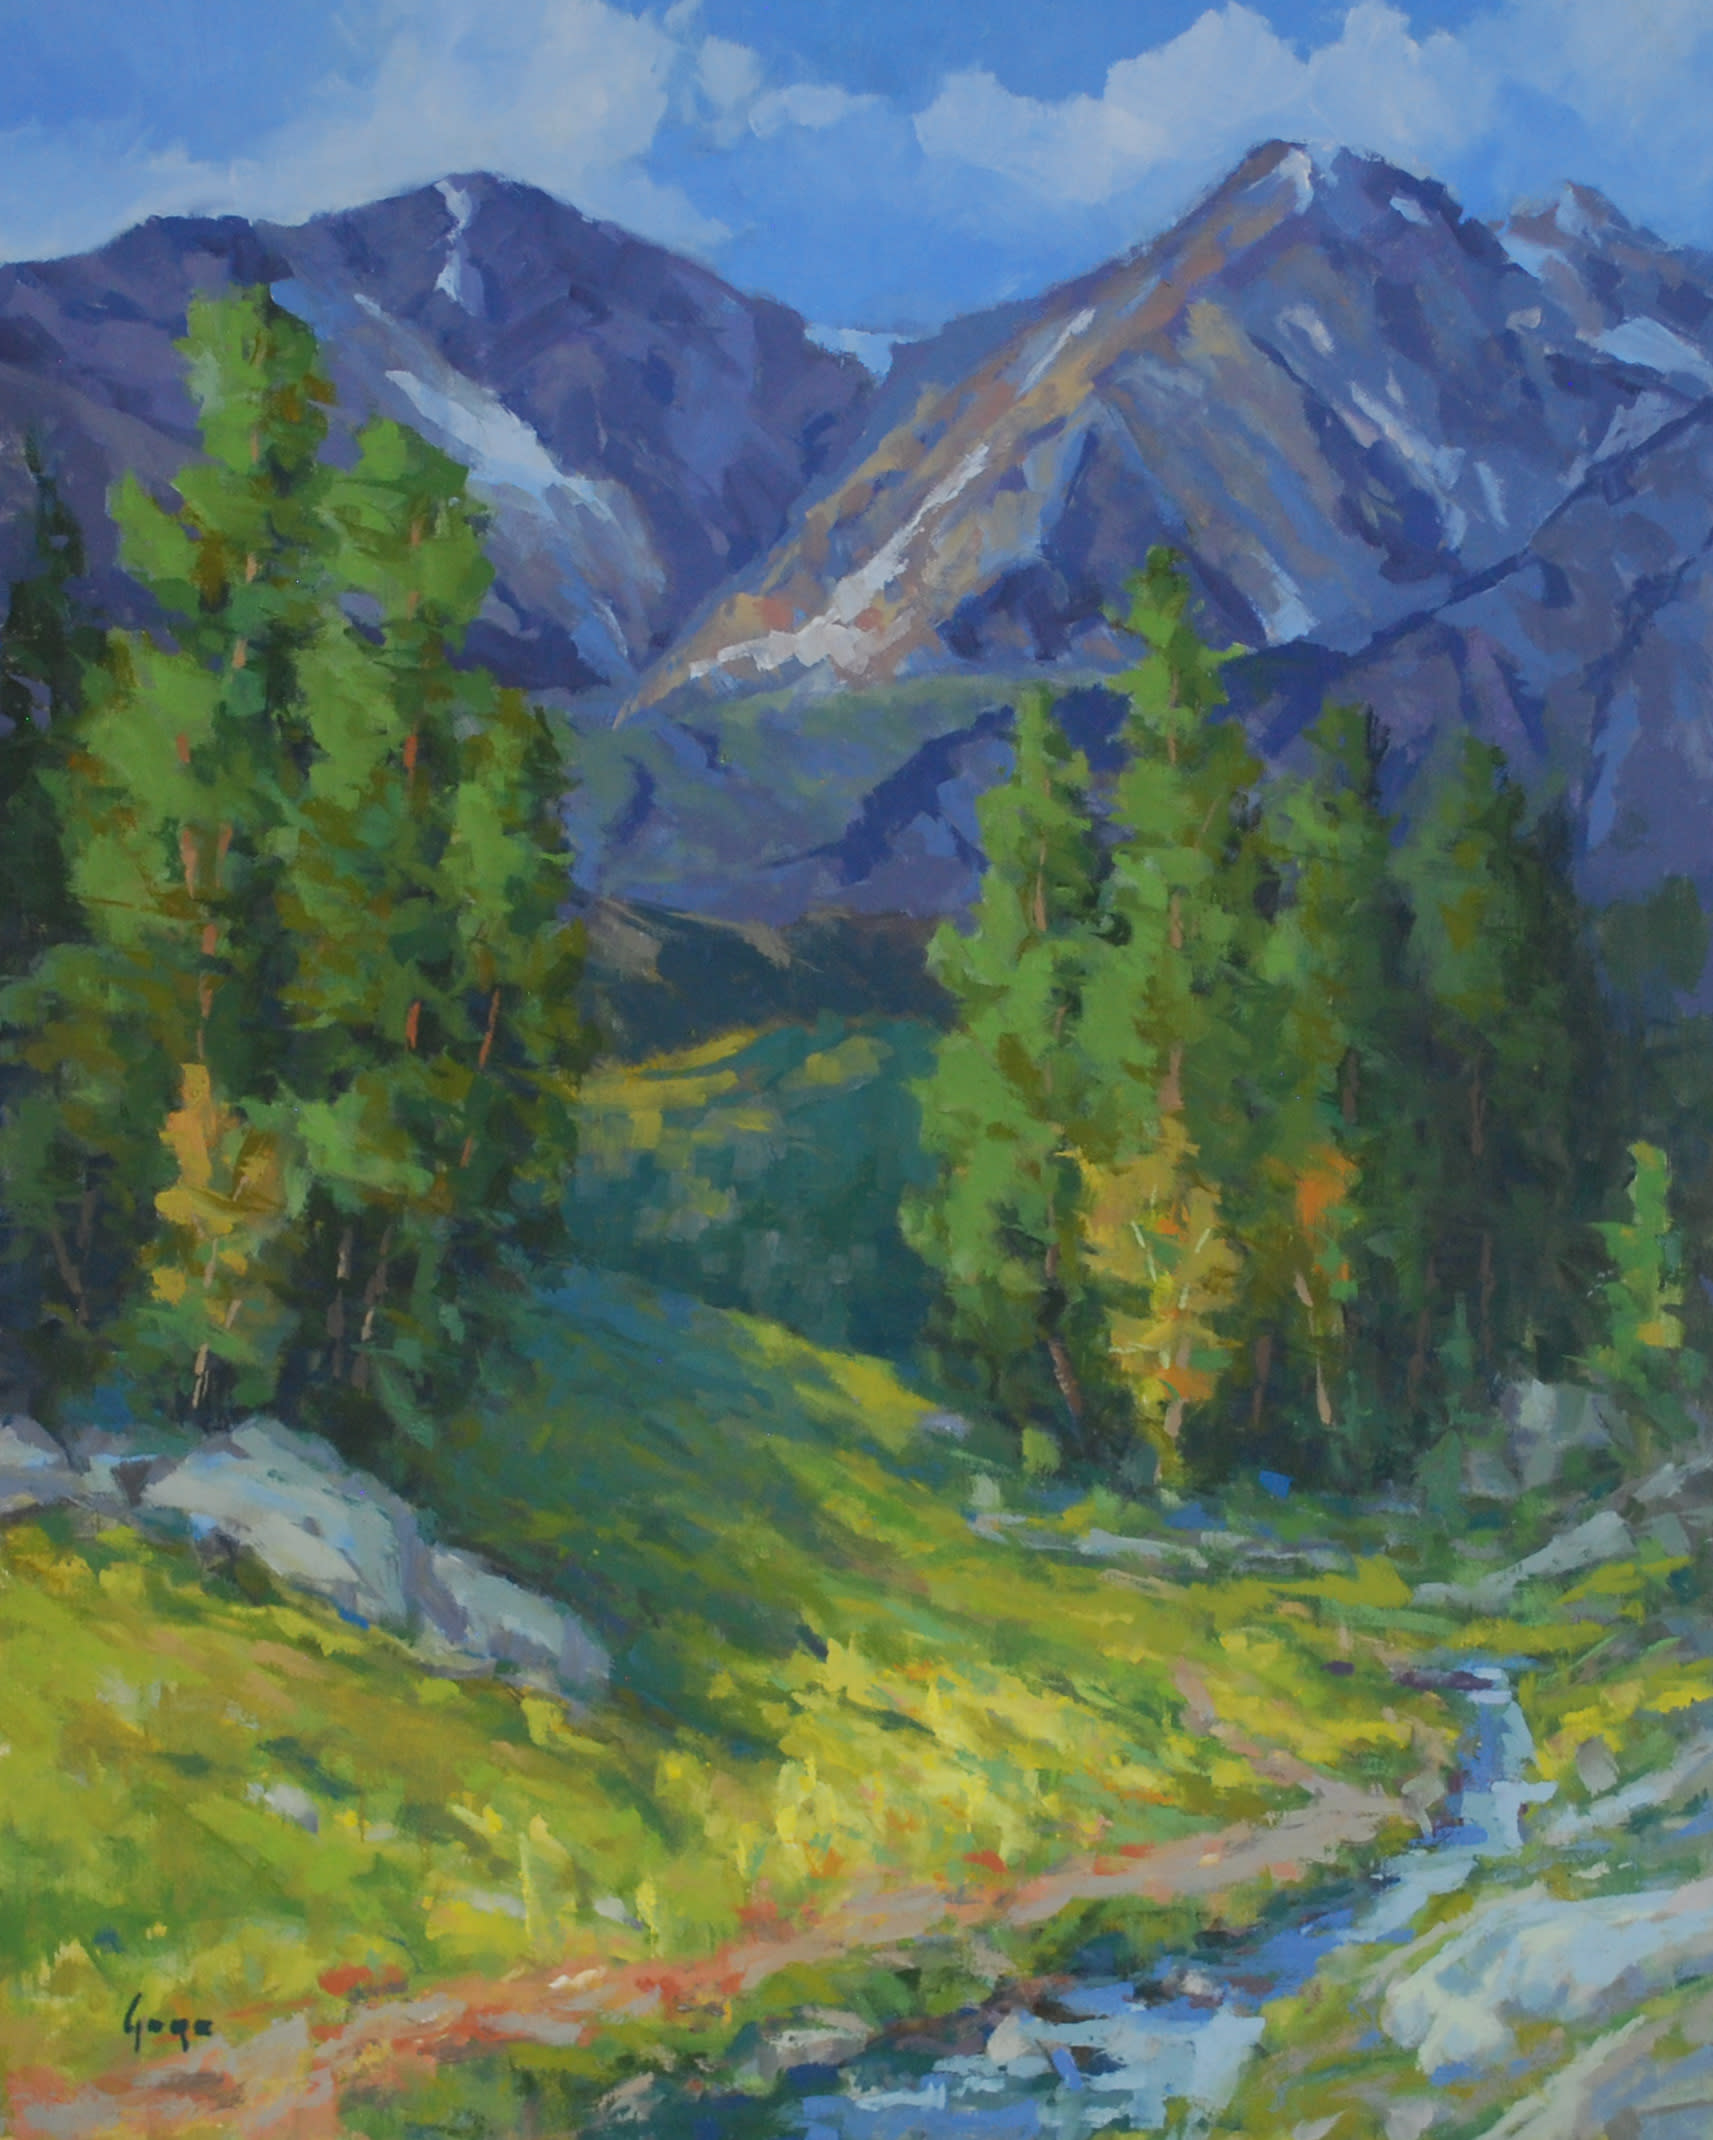 Indian peaks trail t5iy2p